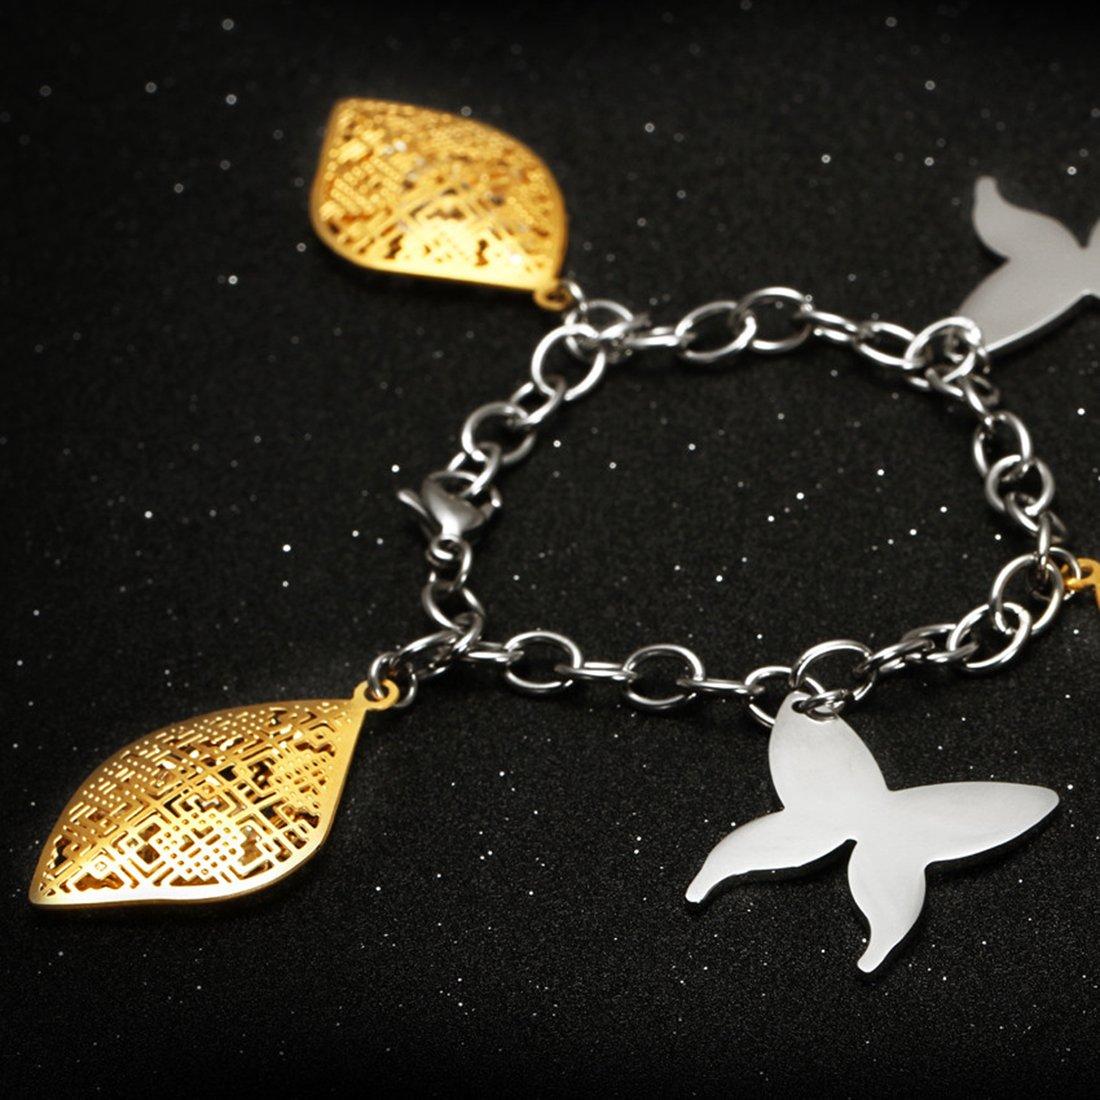 Hardart Butterfly Shell Hollowed Stainless Steel Charm Bracelet